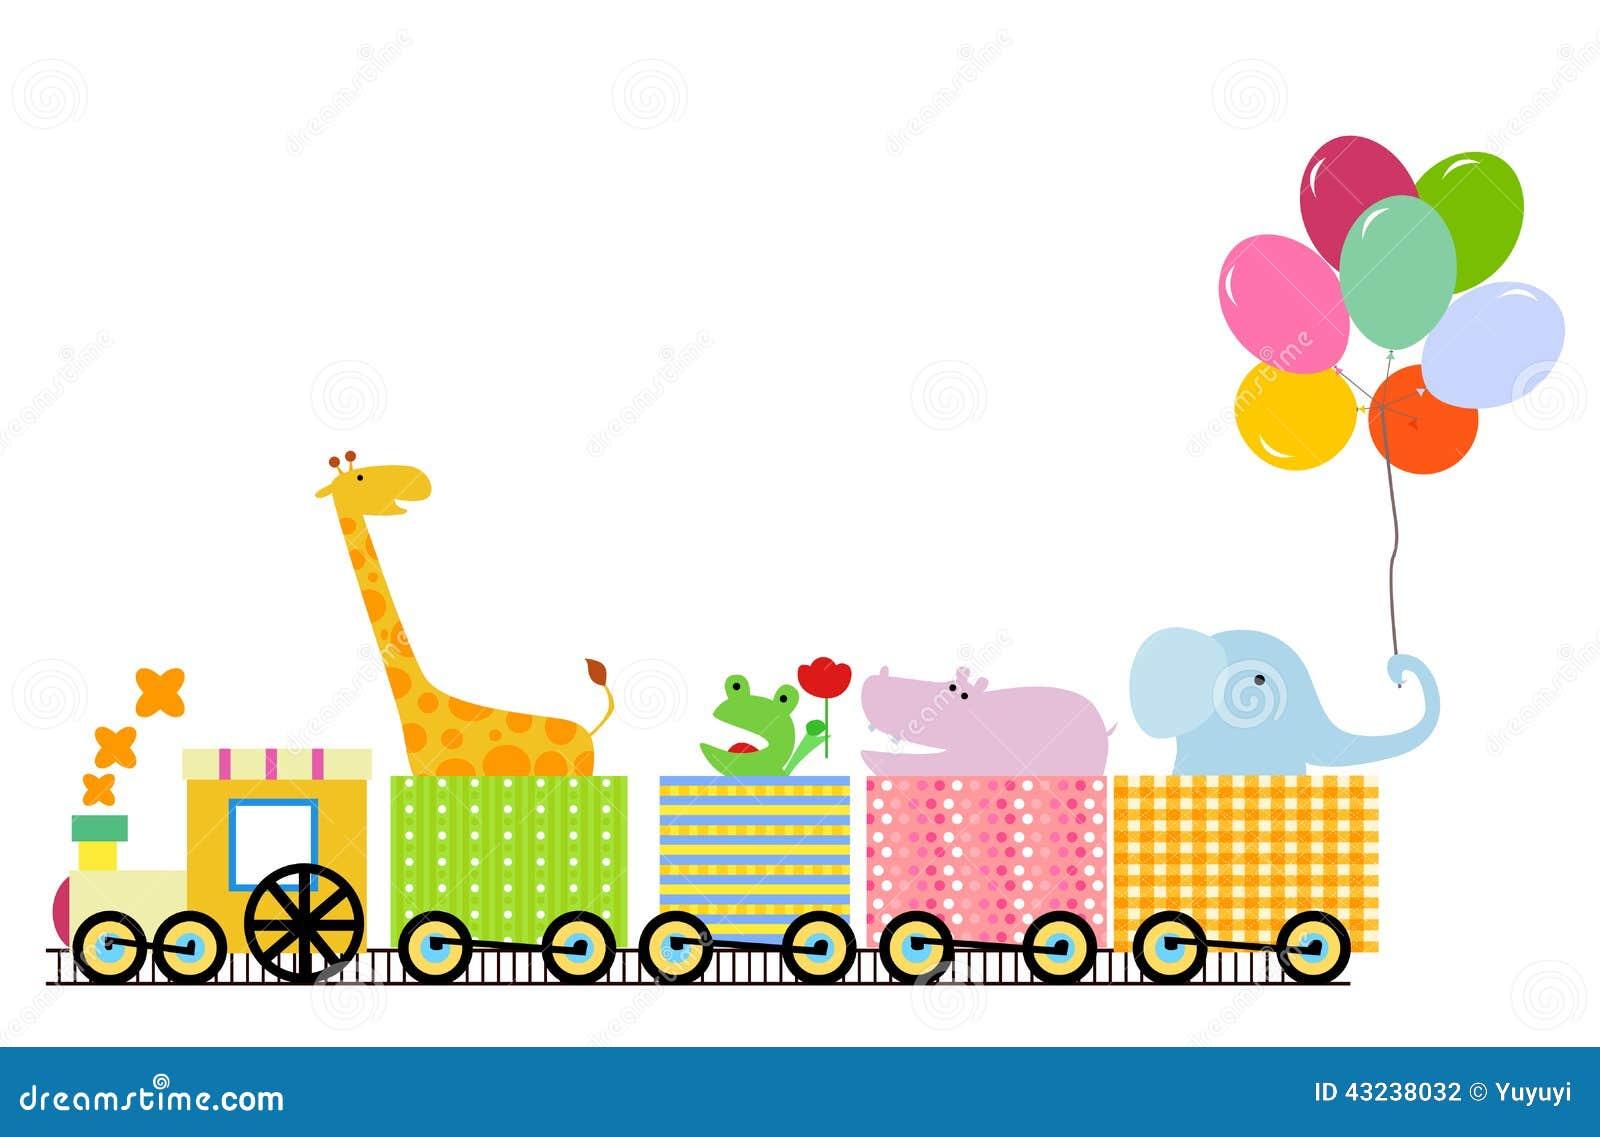 Animal Train Stock Vector - Image: 43238032